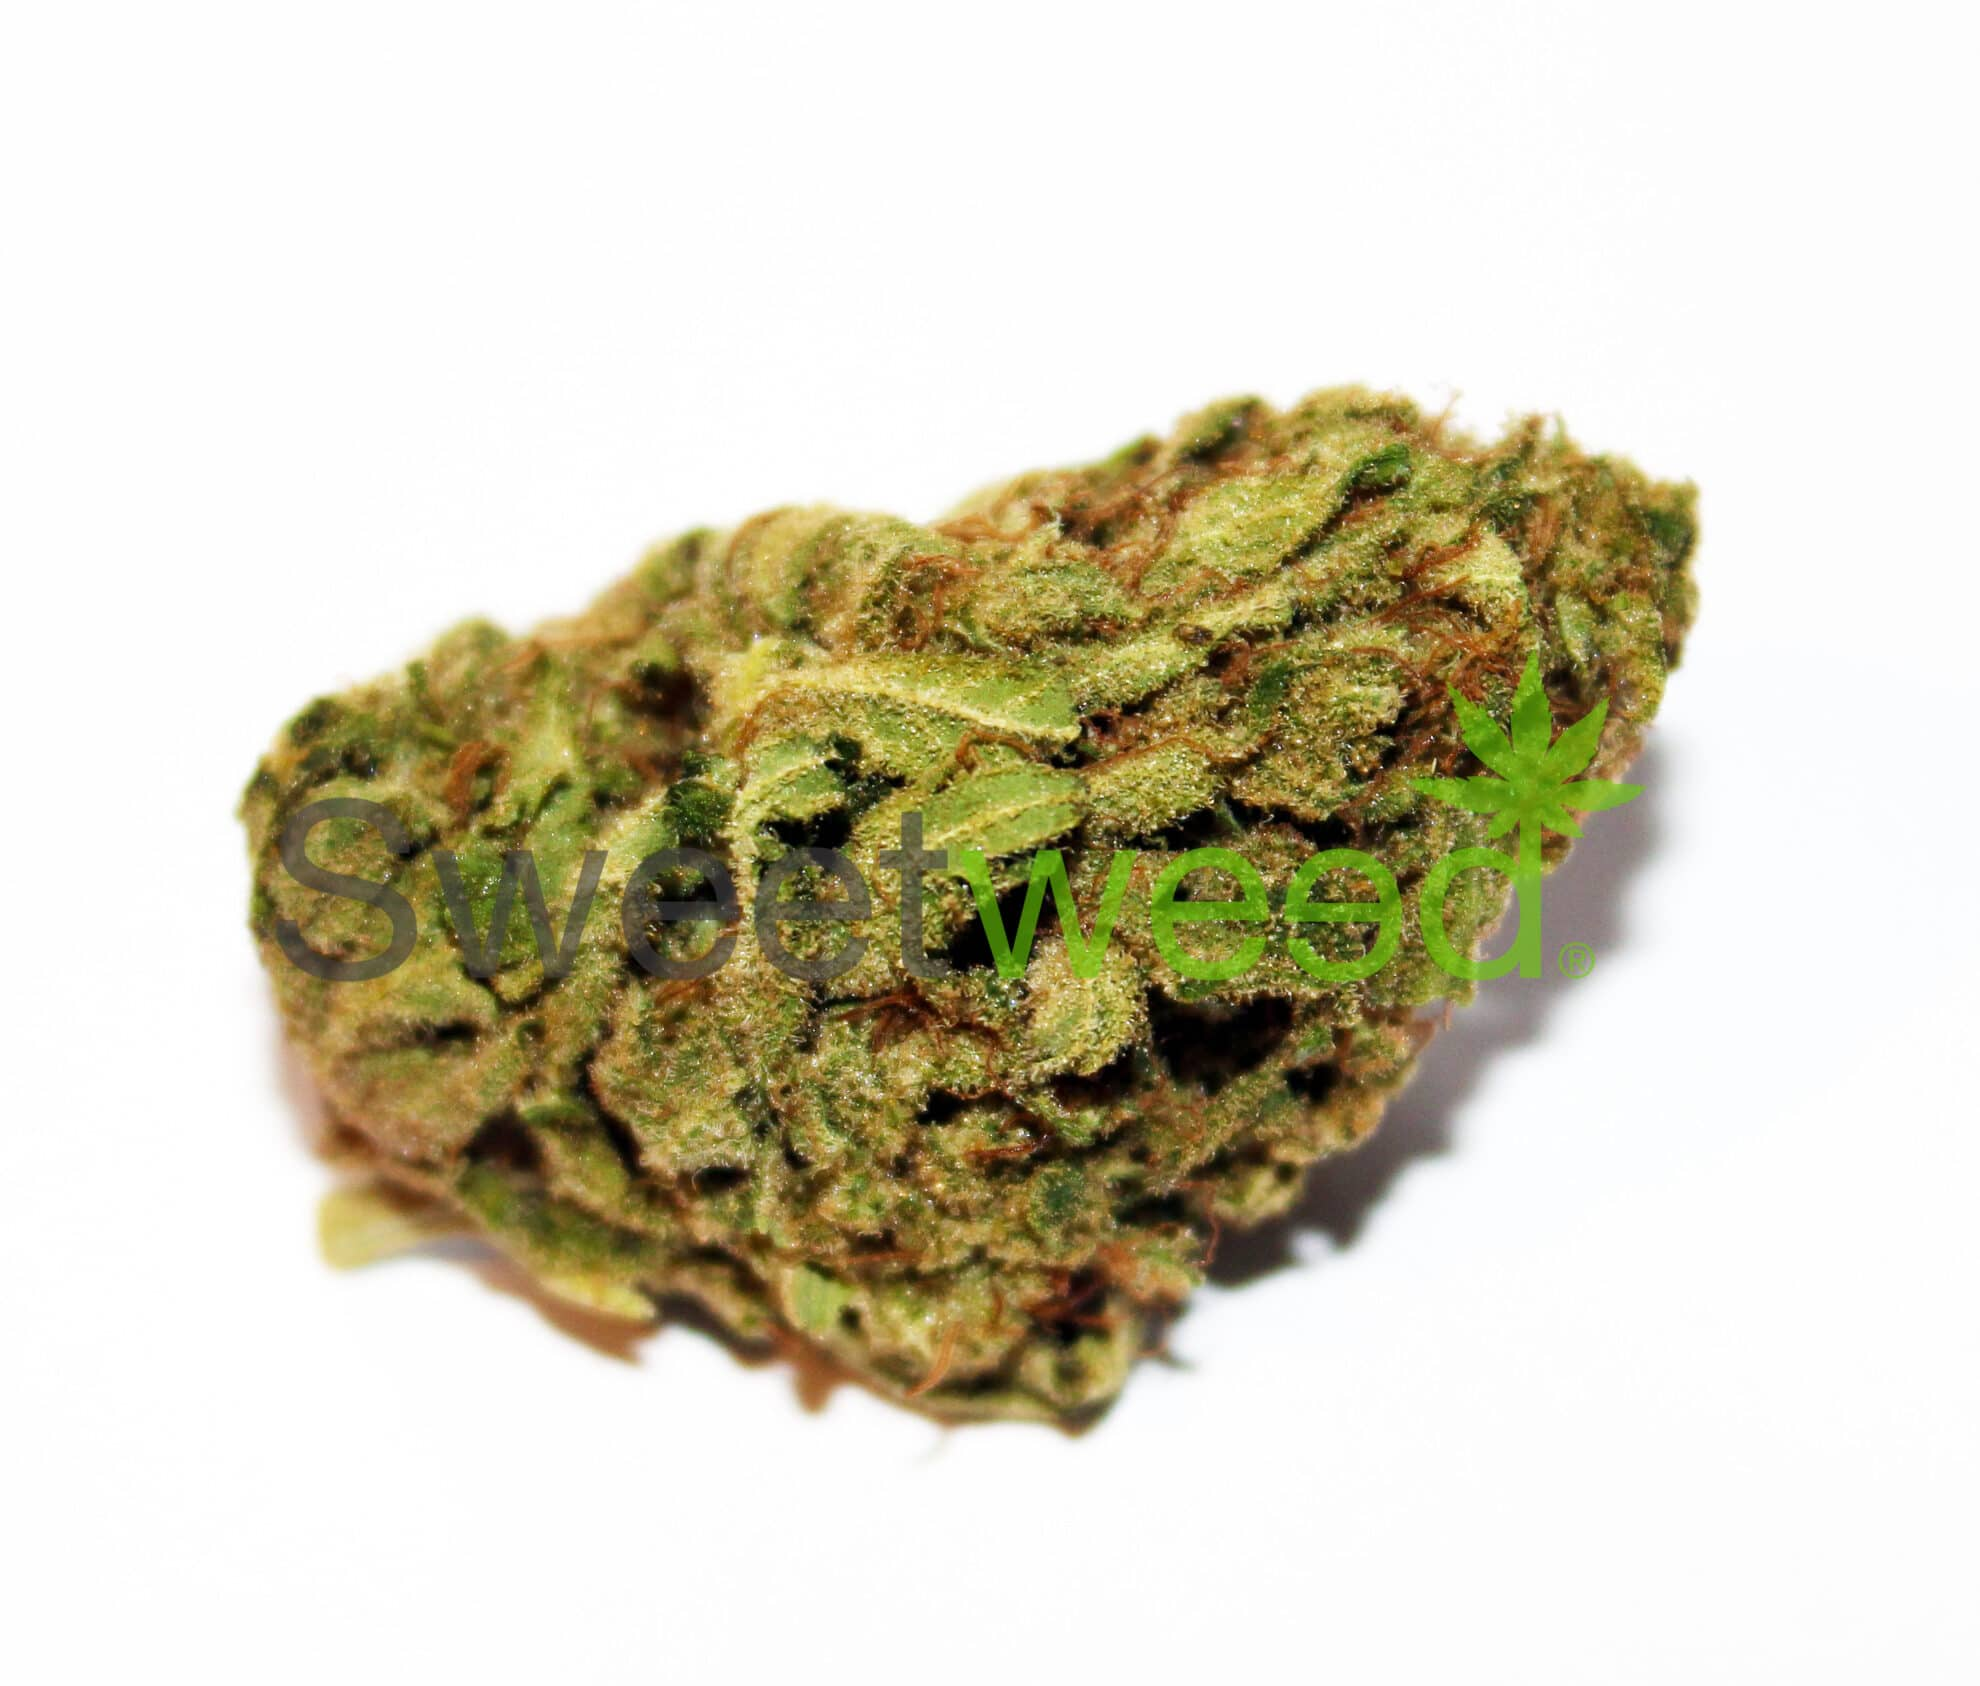 >0.2% THC